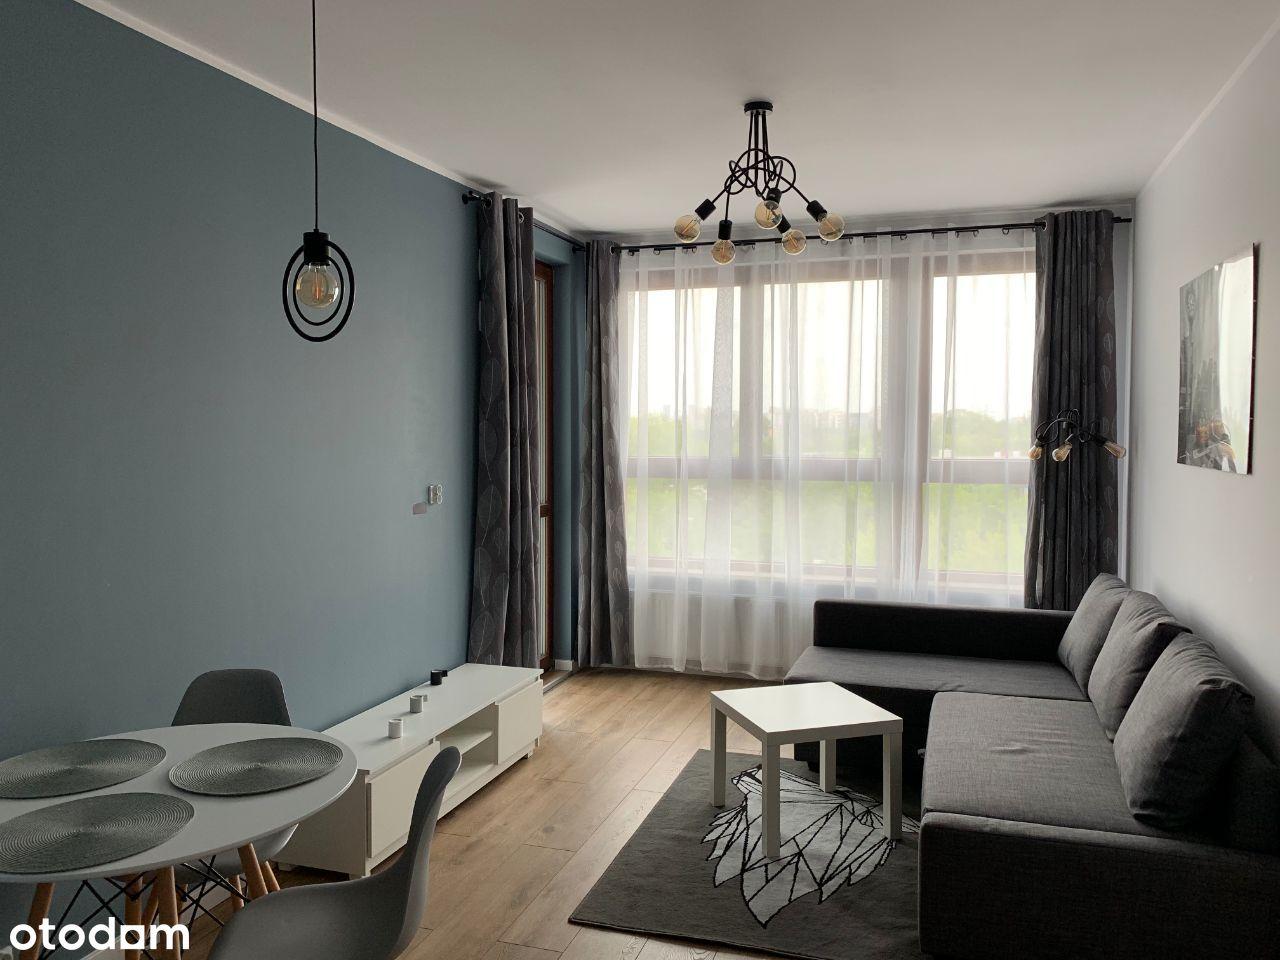 2 pok mieszkanie 39m2, Bemowo, garaż, tv, internet